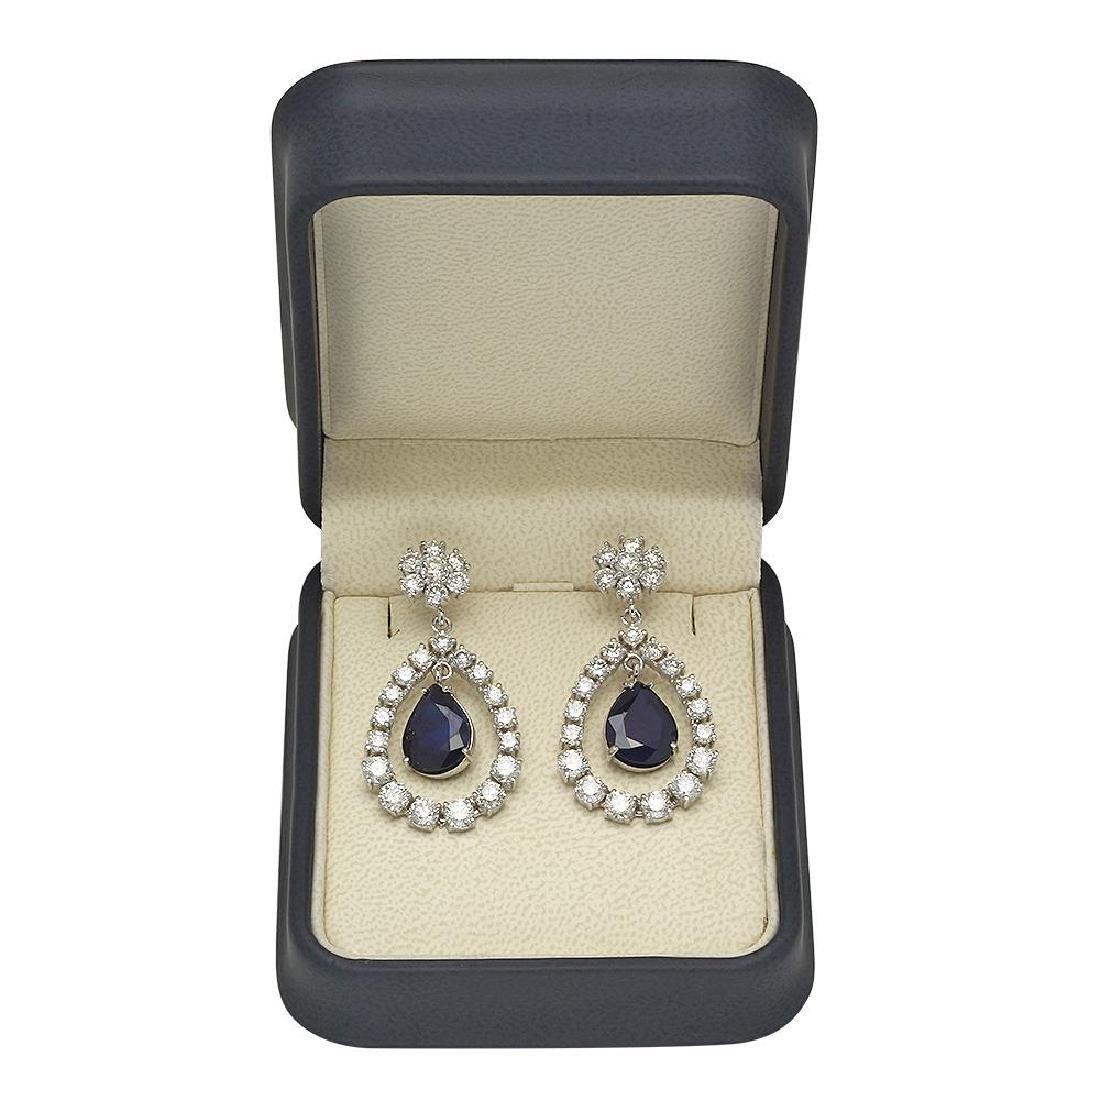 14K Gold  10.37ct Sapphire 7.08ct Diamond Earrings - 2